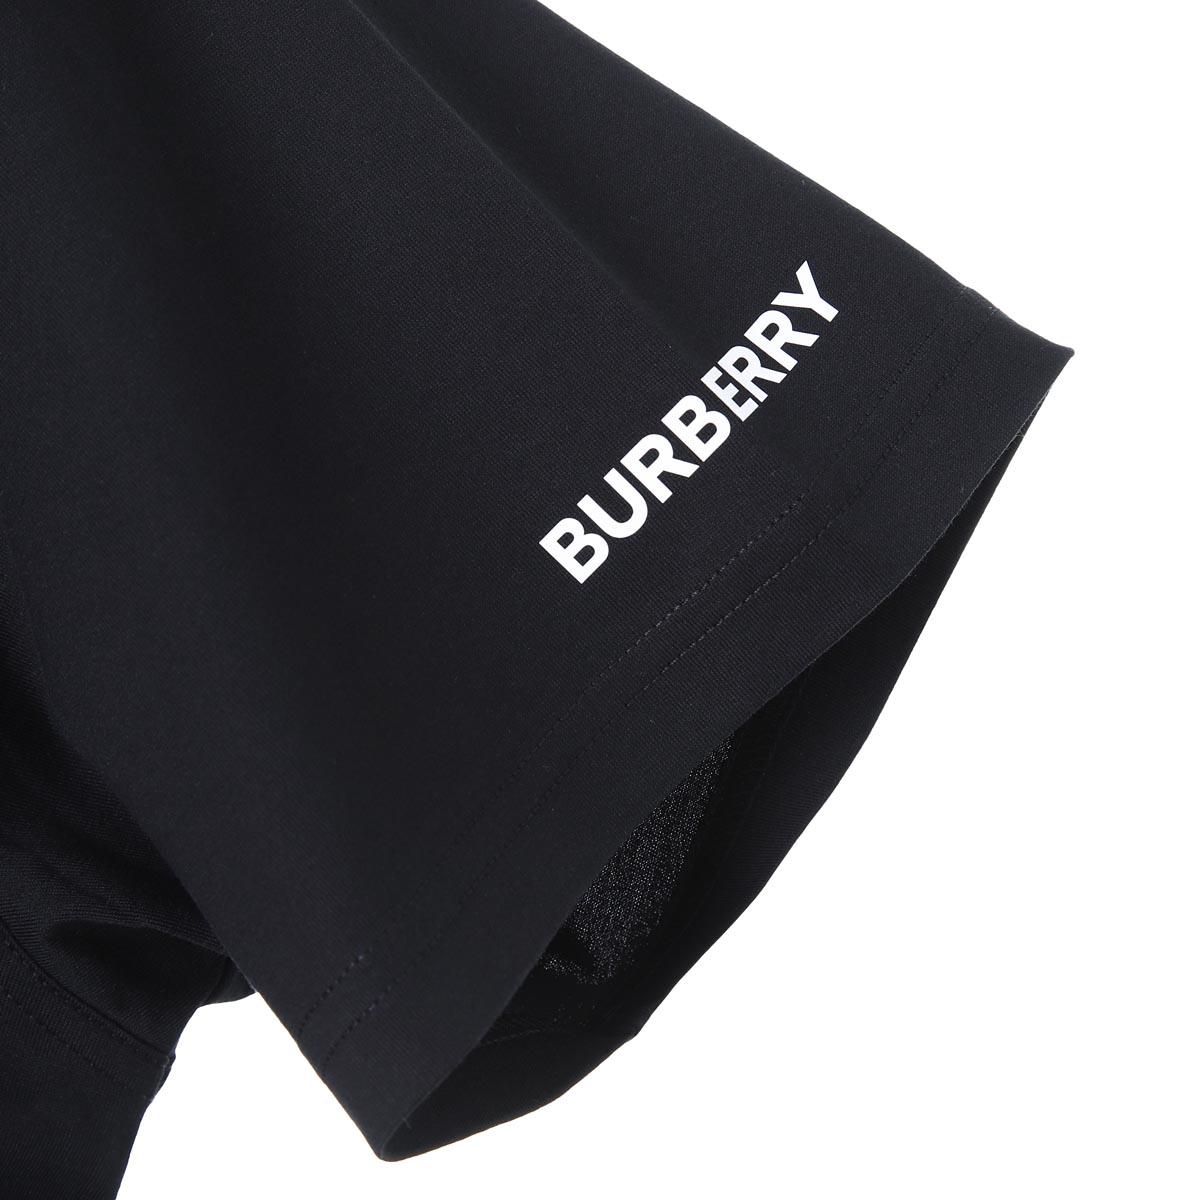 BURBERRY バーバリー クルーネック Tシャツ/MONTAGEPRINT COTTON OVERSIZED T-SHIRTメンズ